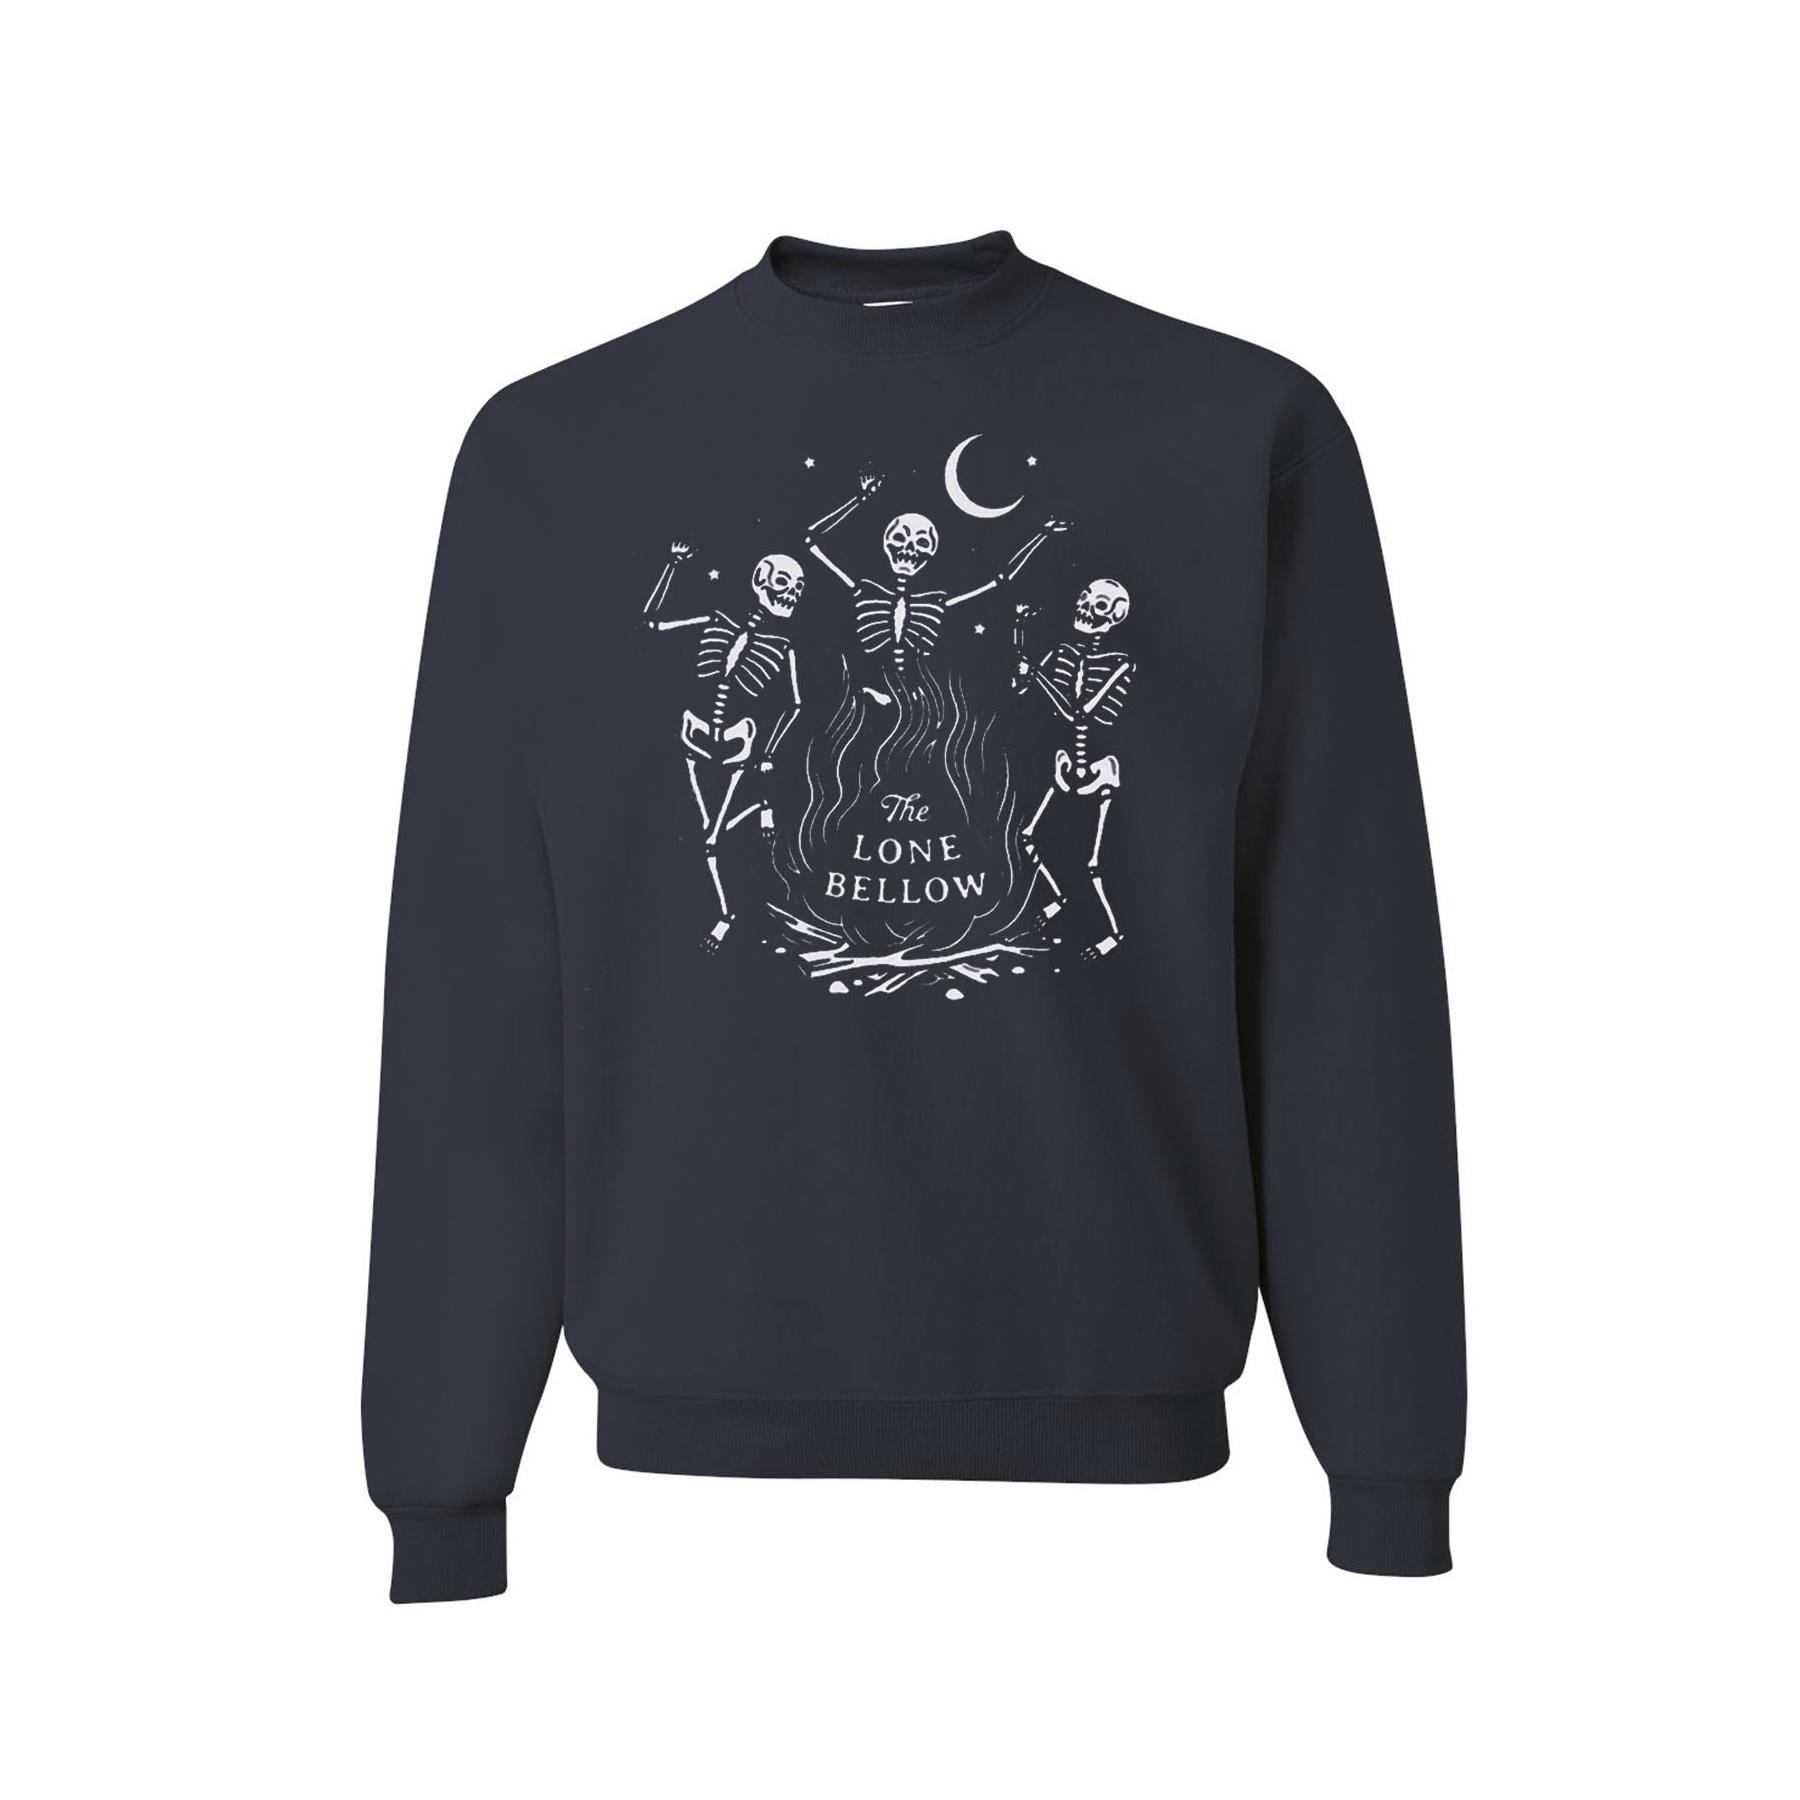 Unisex Skeleton Sweatshirt